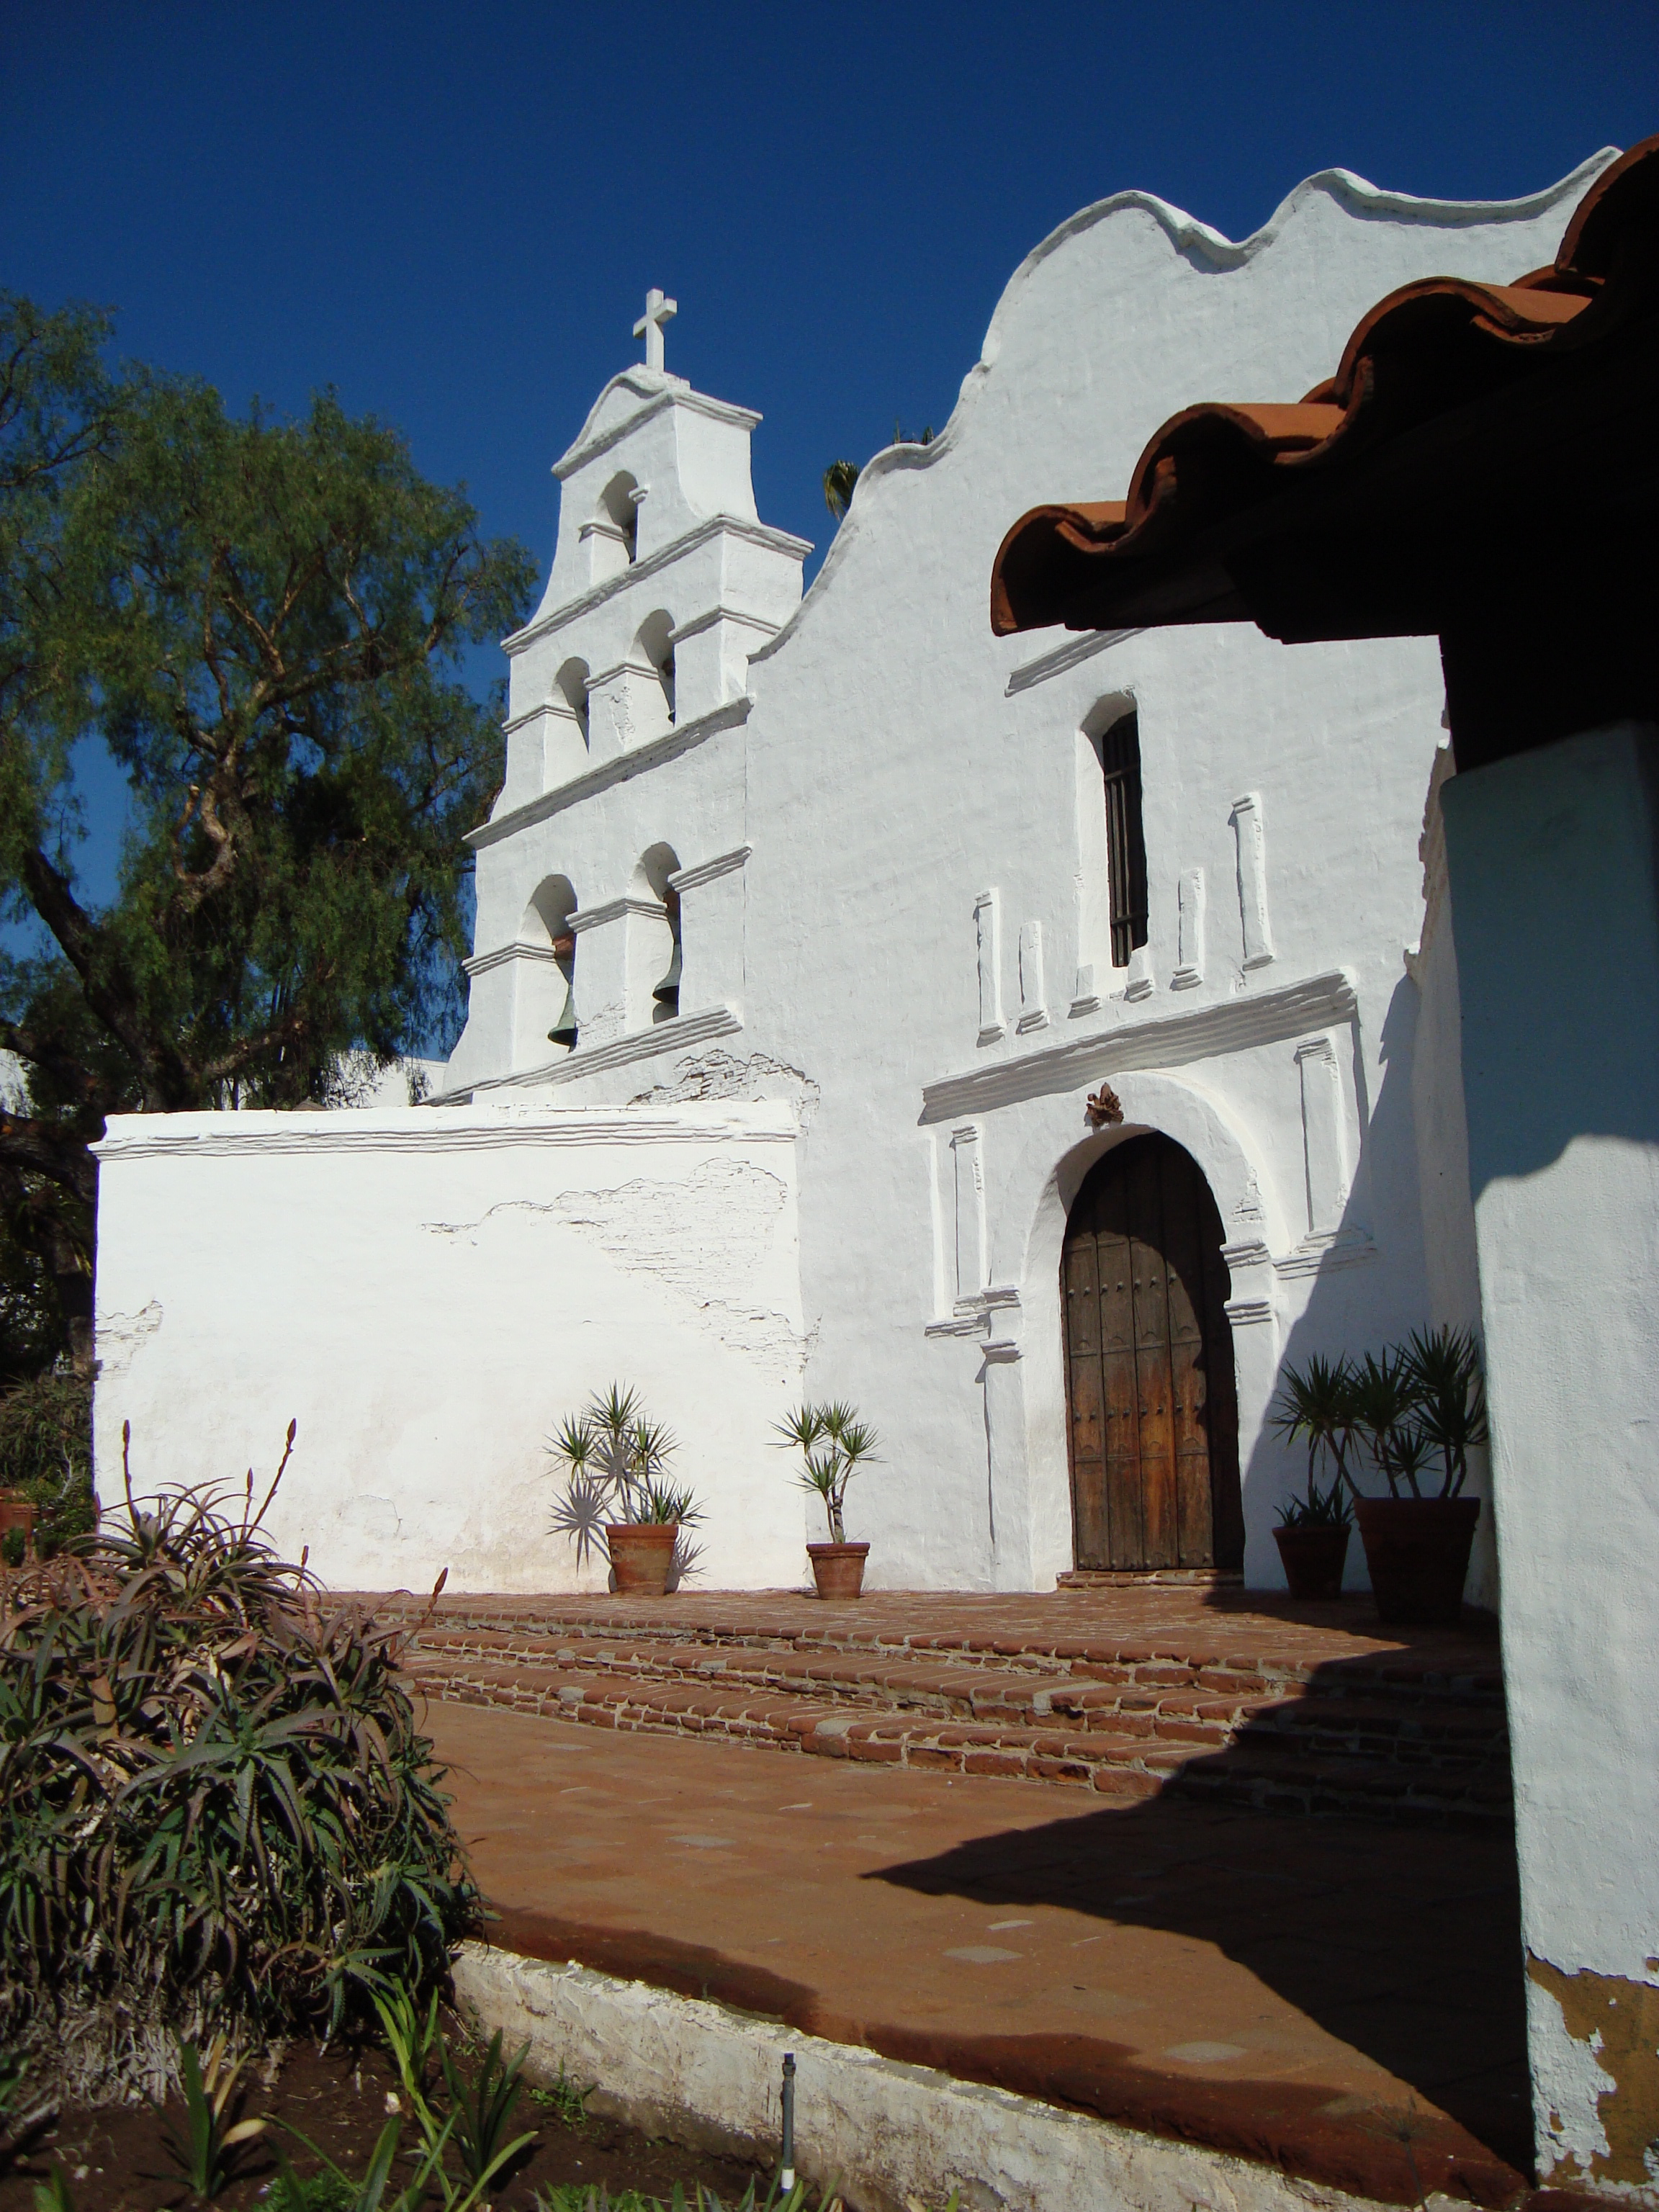 San Diego Hometown Tourist: On a Mission inSanDiego